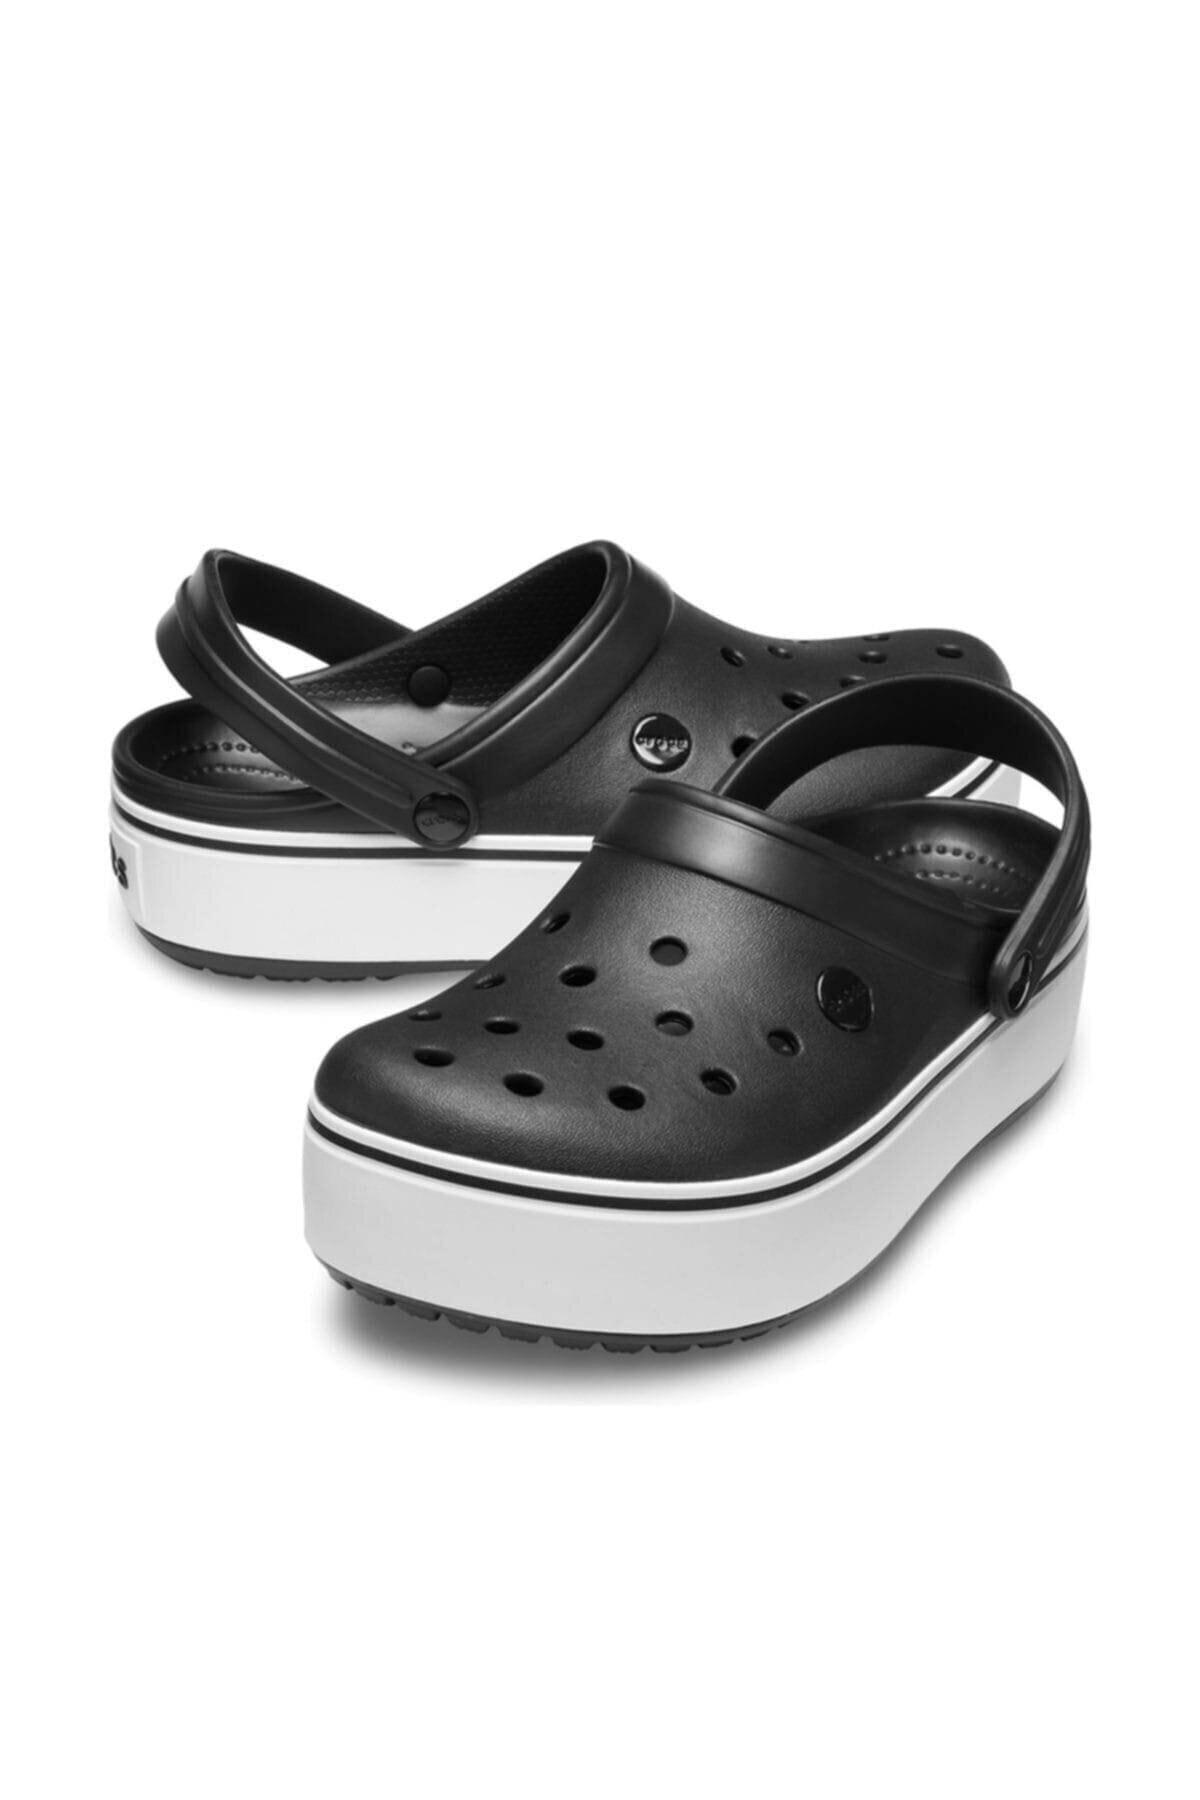 Crocs Kadın Siyah Platform Terlik 205434 2